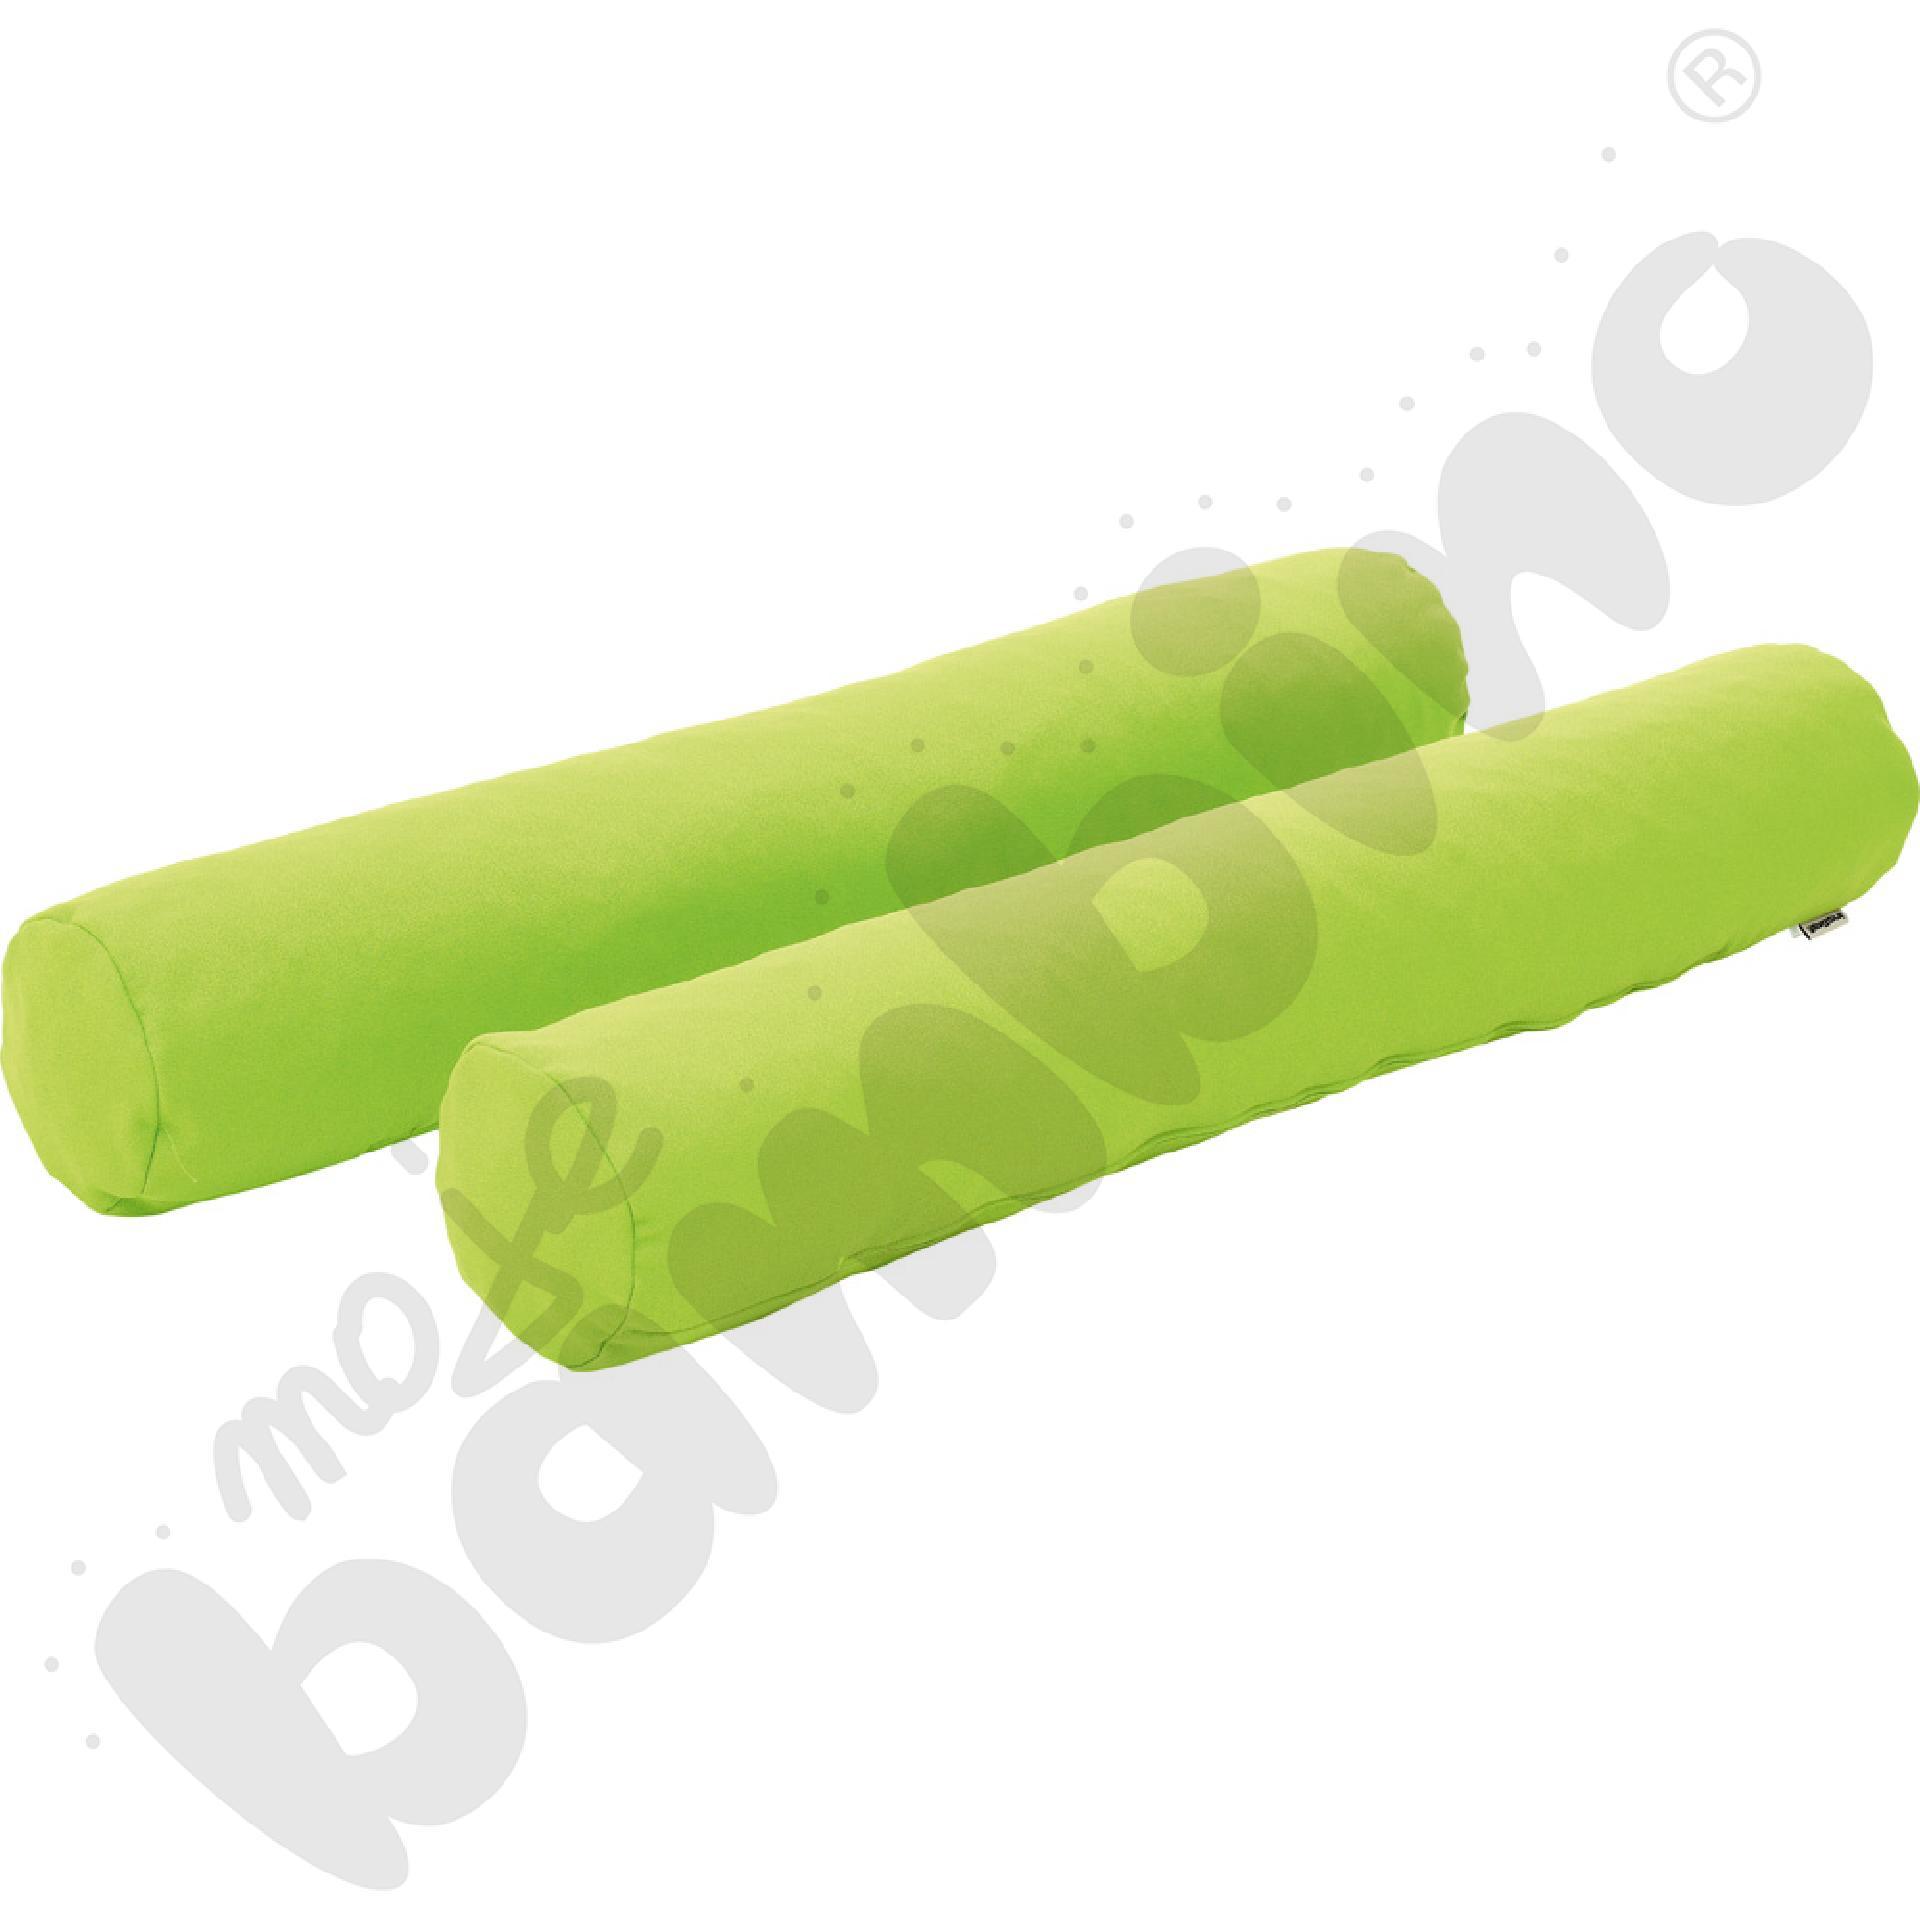 Wałki jasnozielone - tkanina trudnopalna